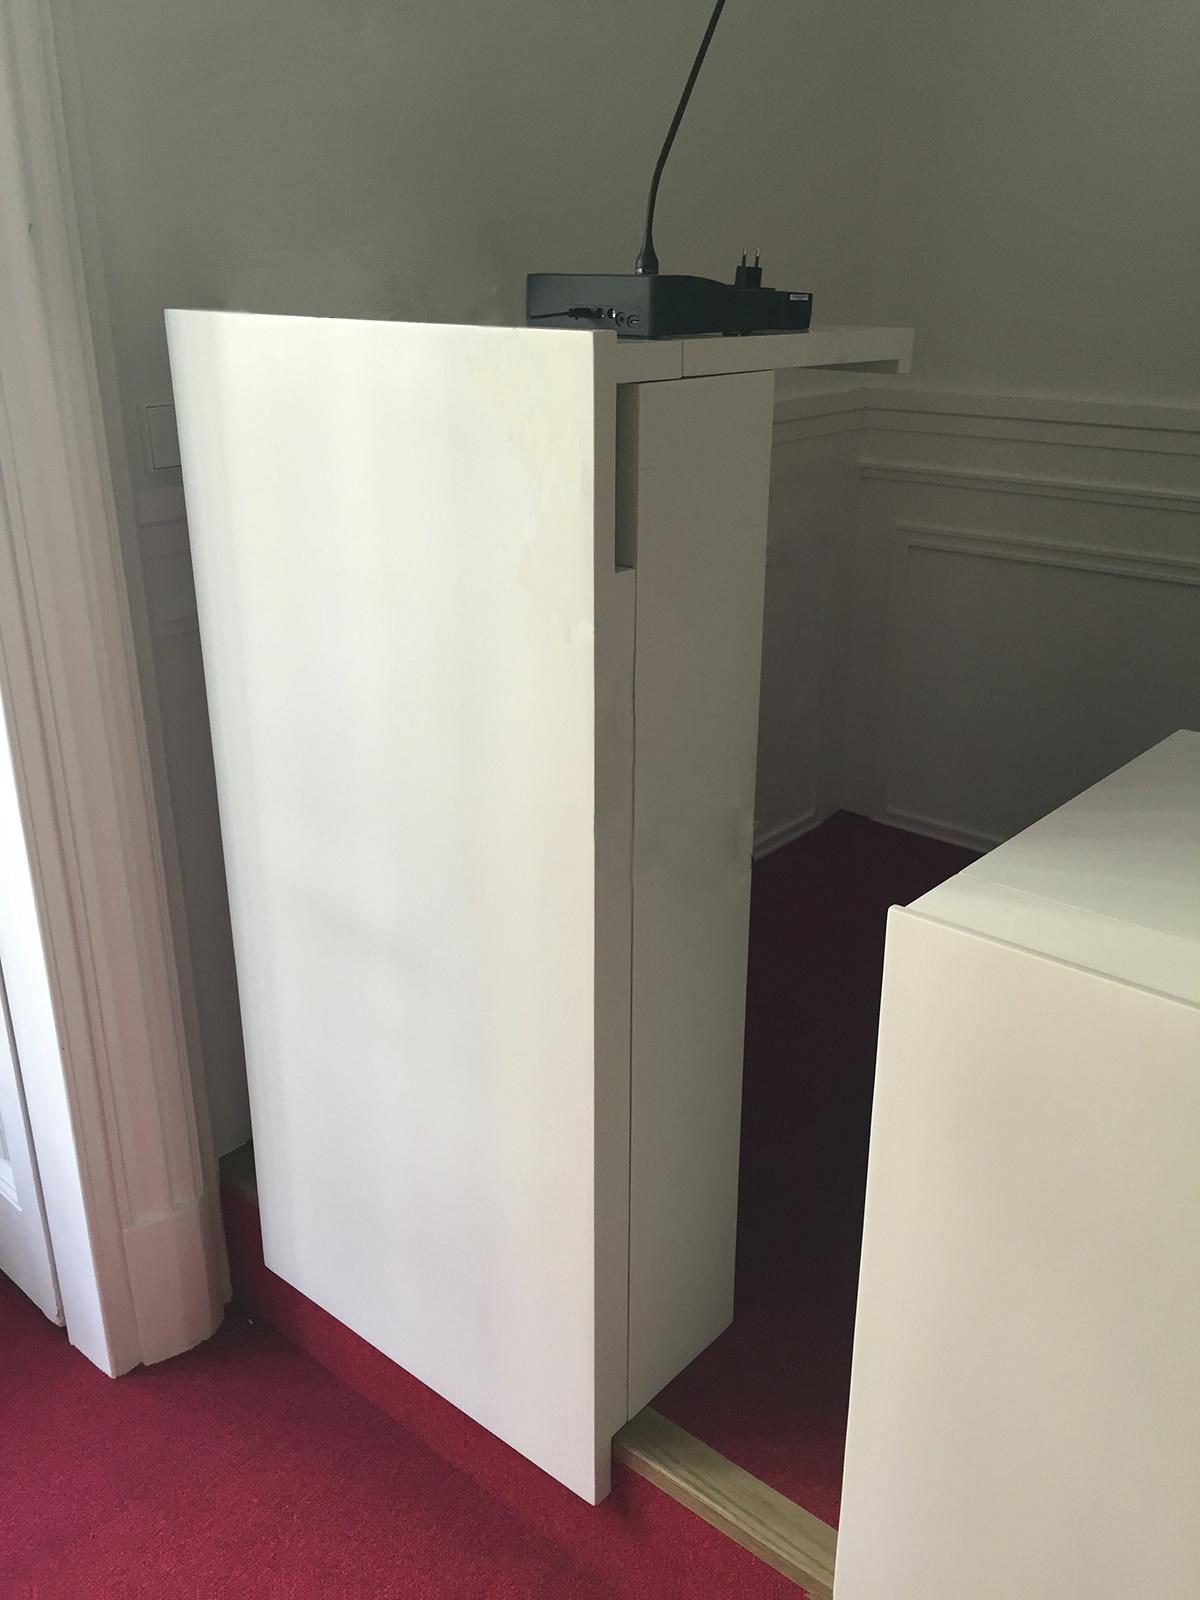 Mesas y atril FMAP